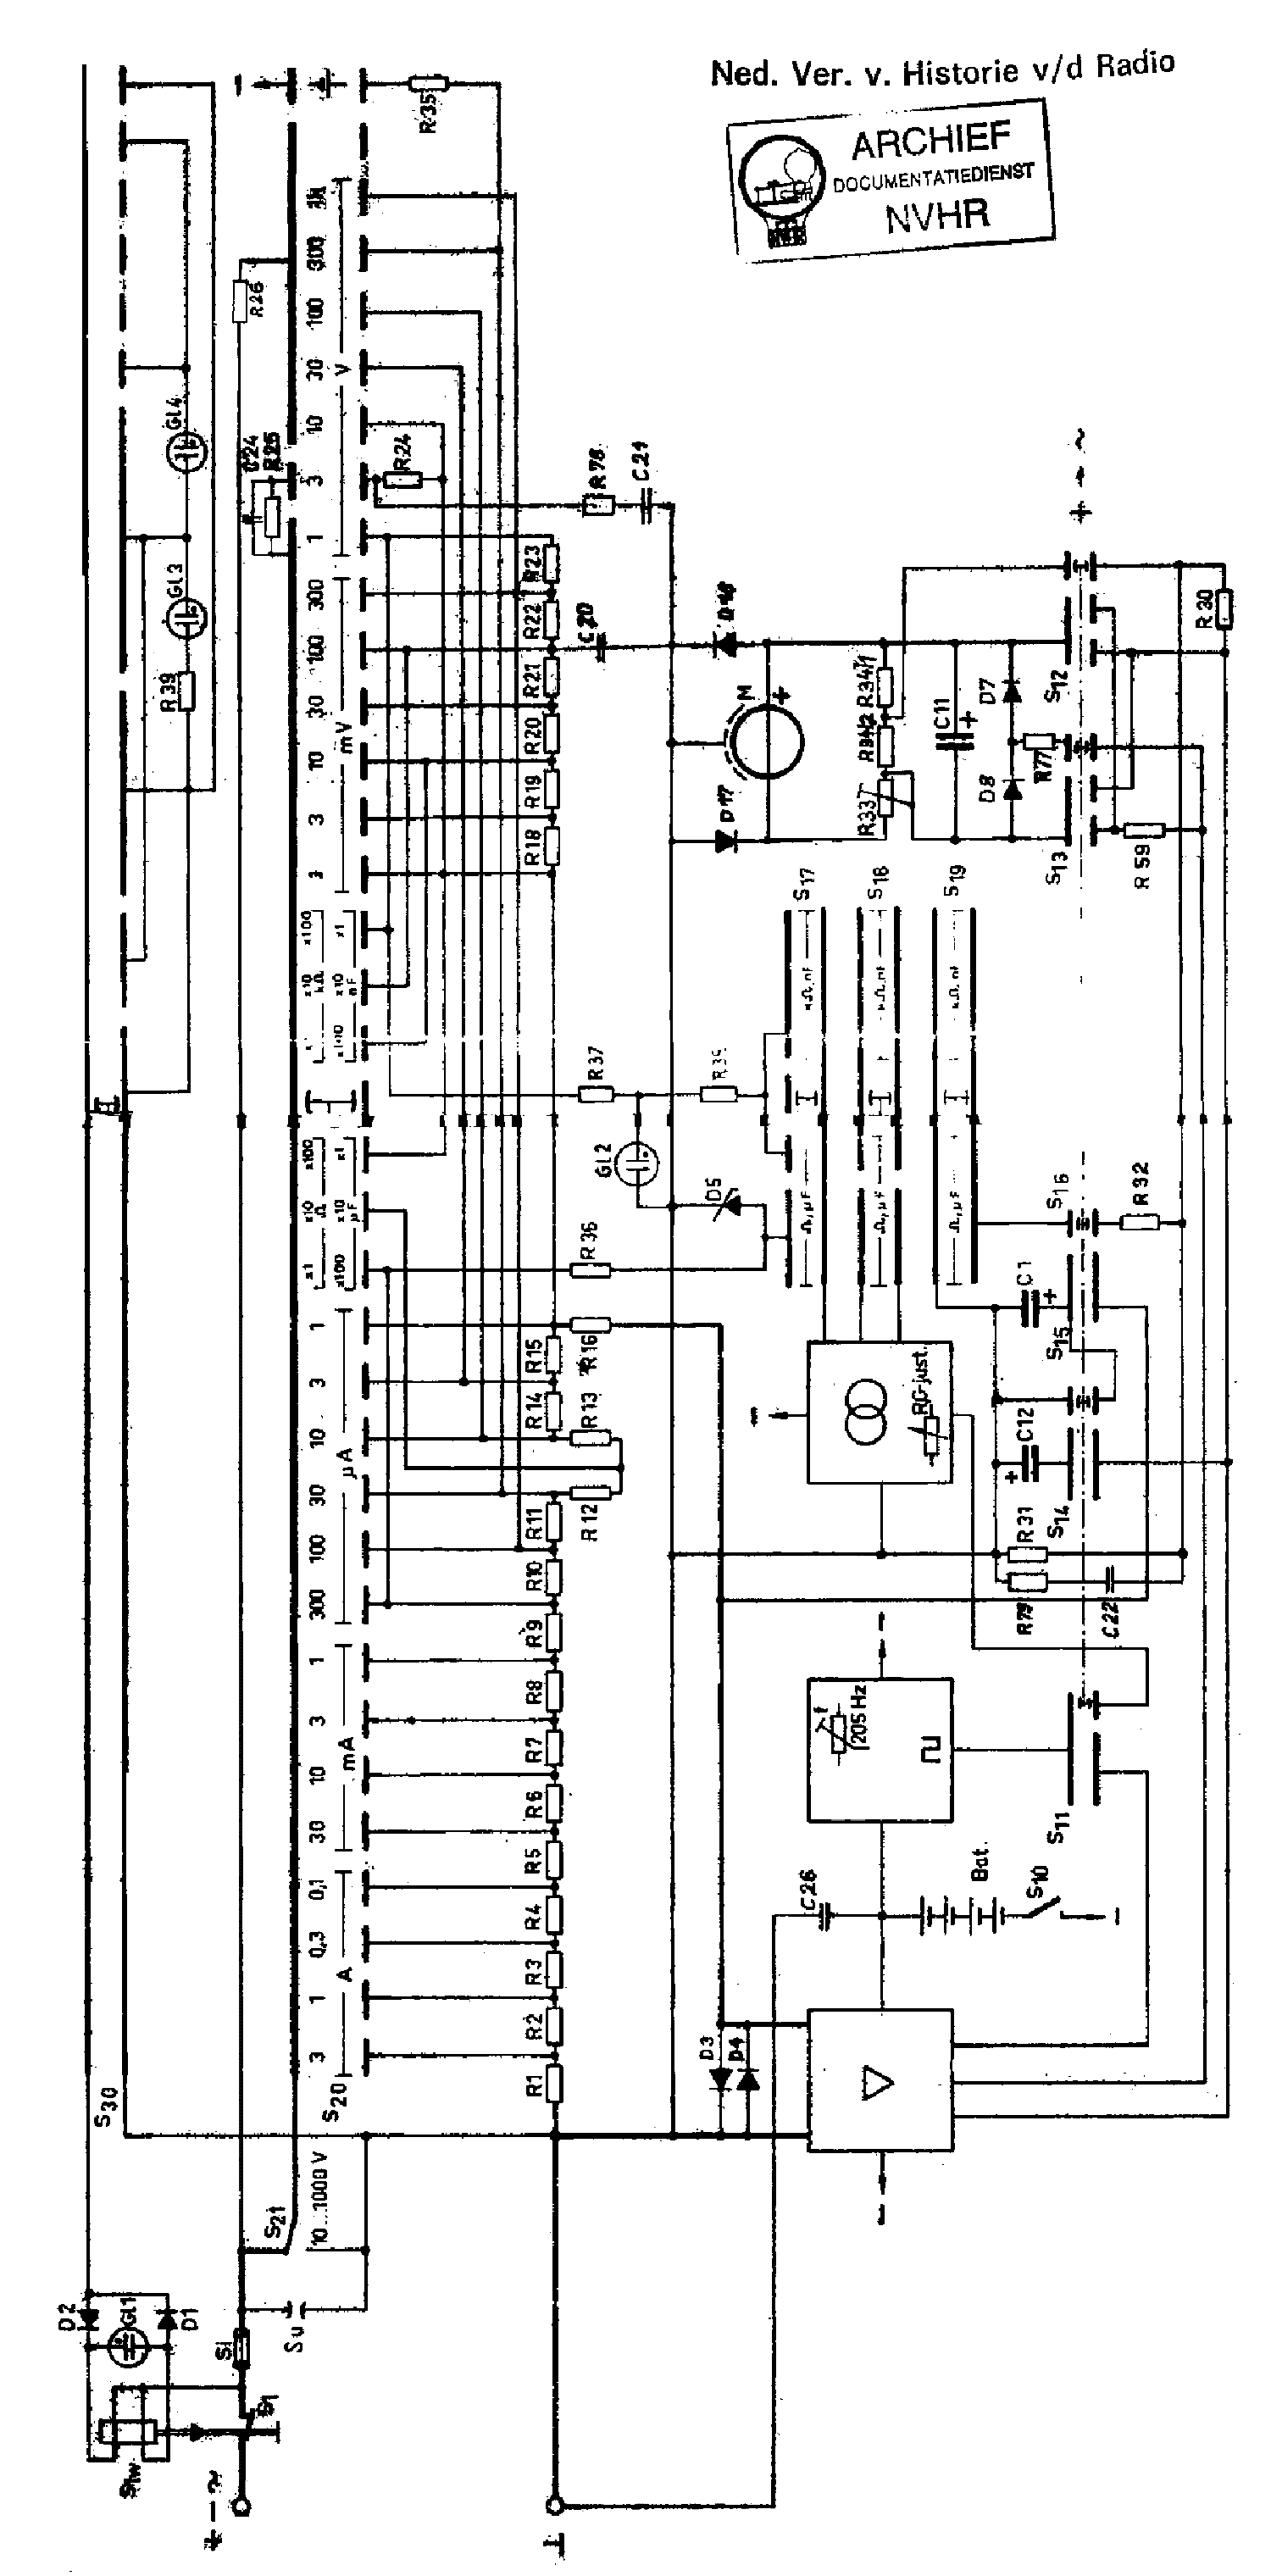 metrawatt unigor 6e analog electronic mm 1973 sch service